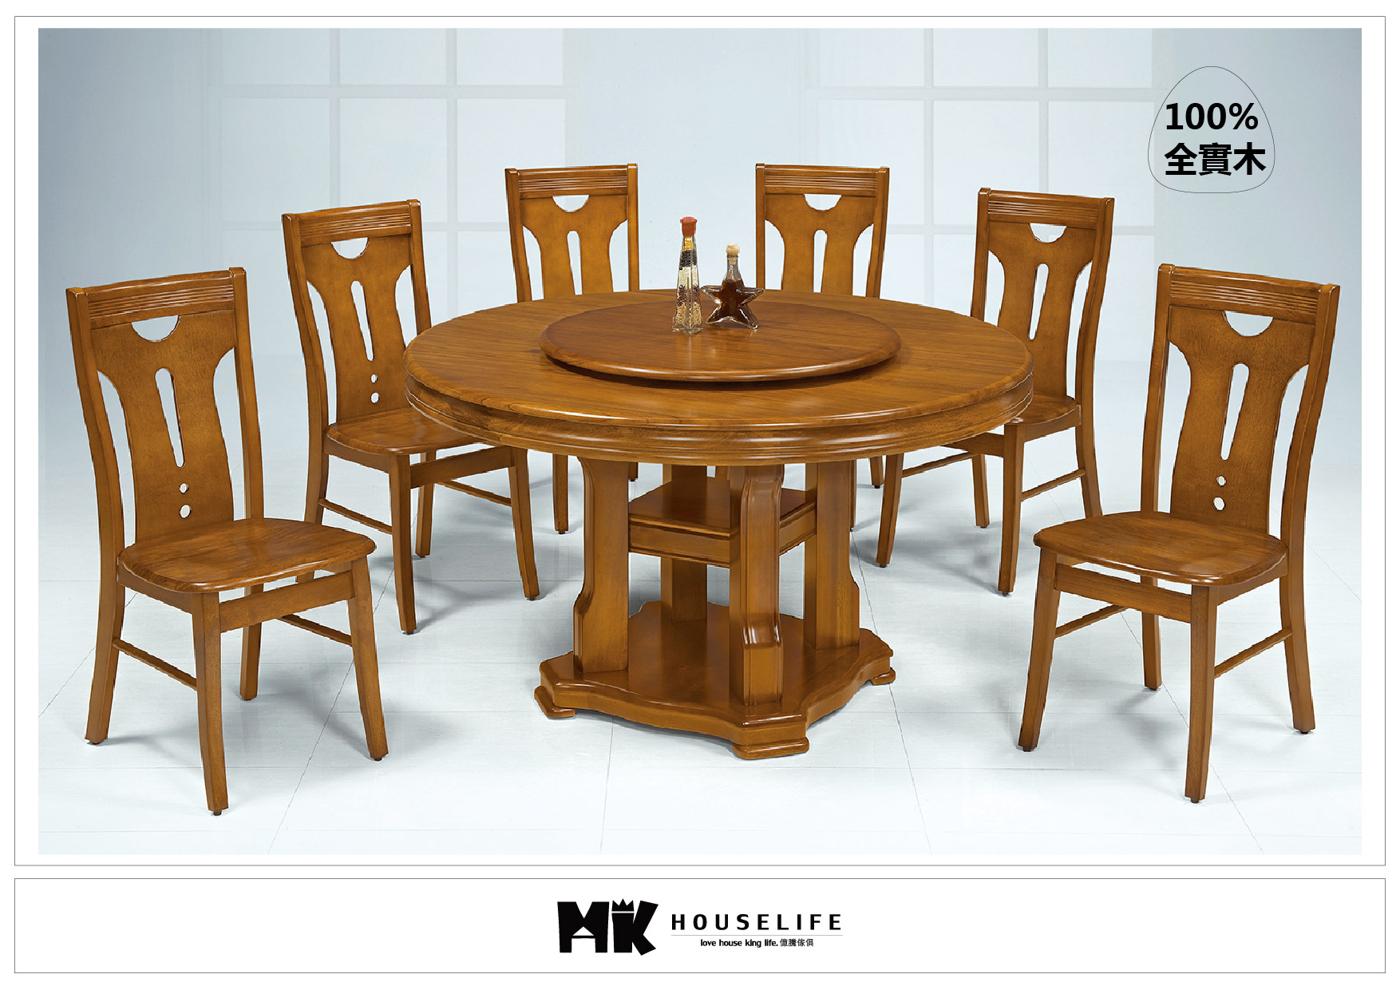 【MK億騰傢俱】AS310-02柚木色4.86尺轉盤餐桌(不含椅)